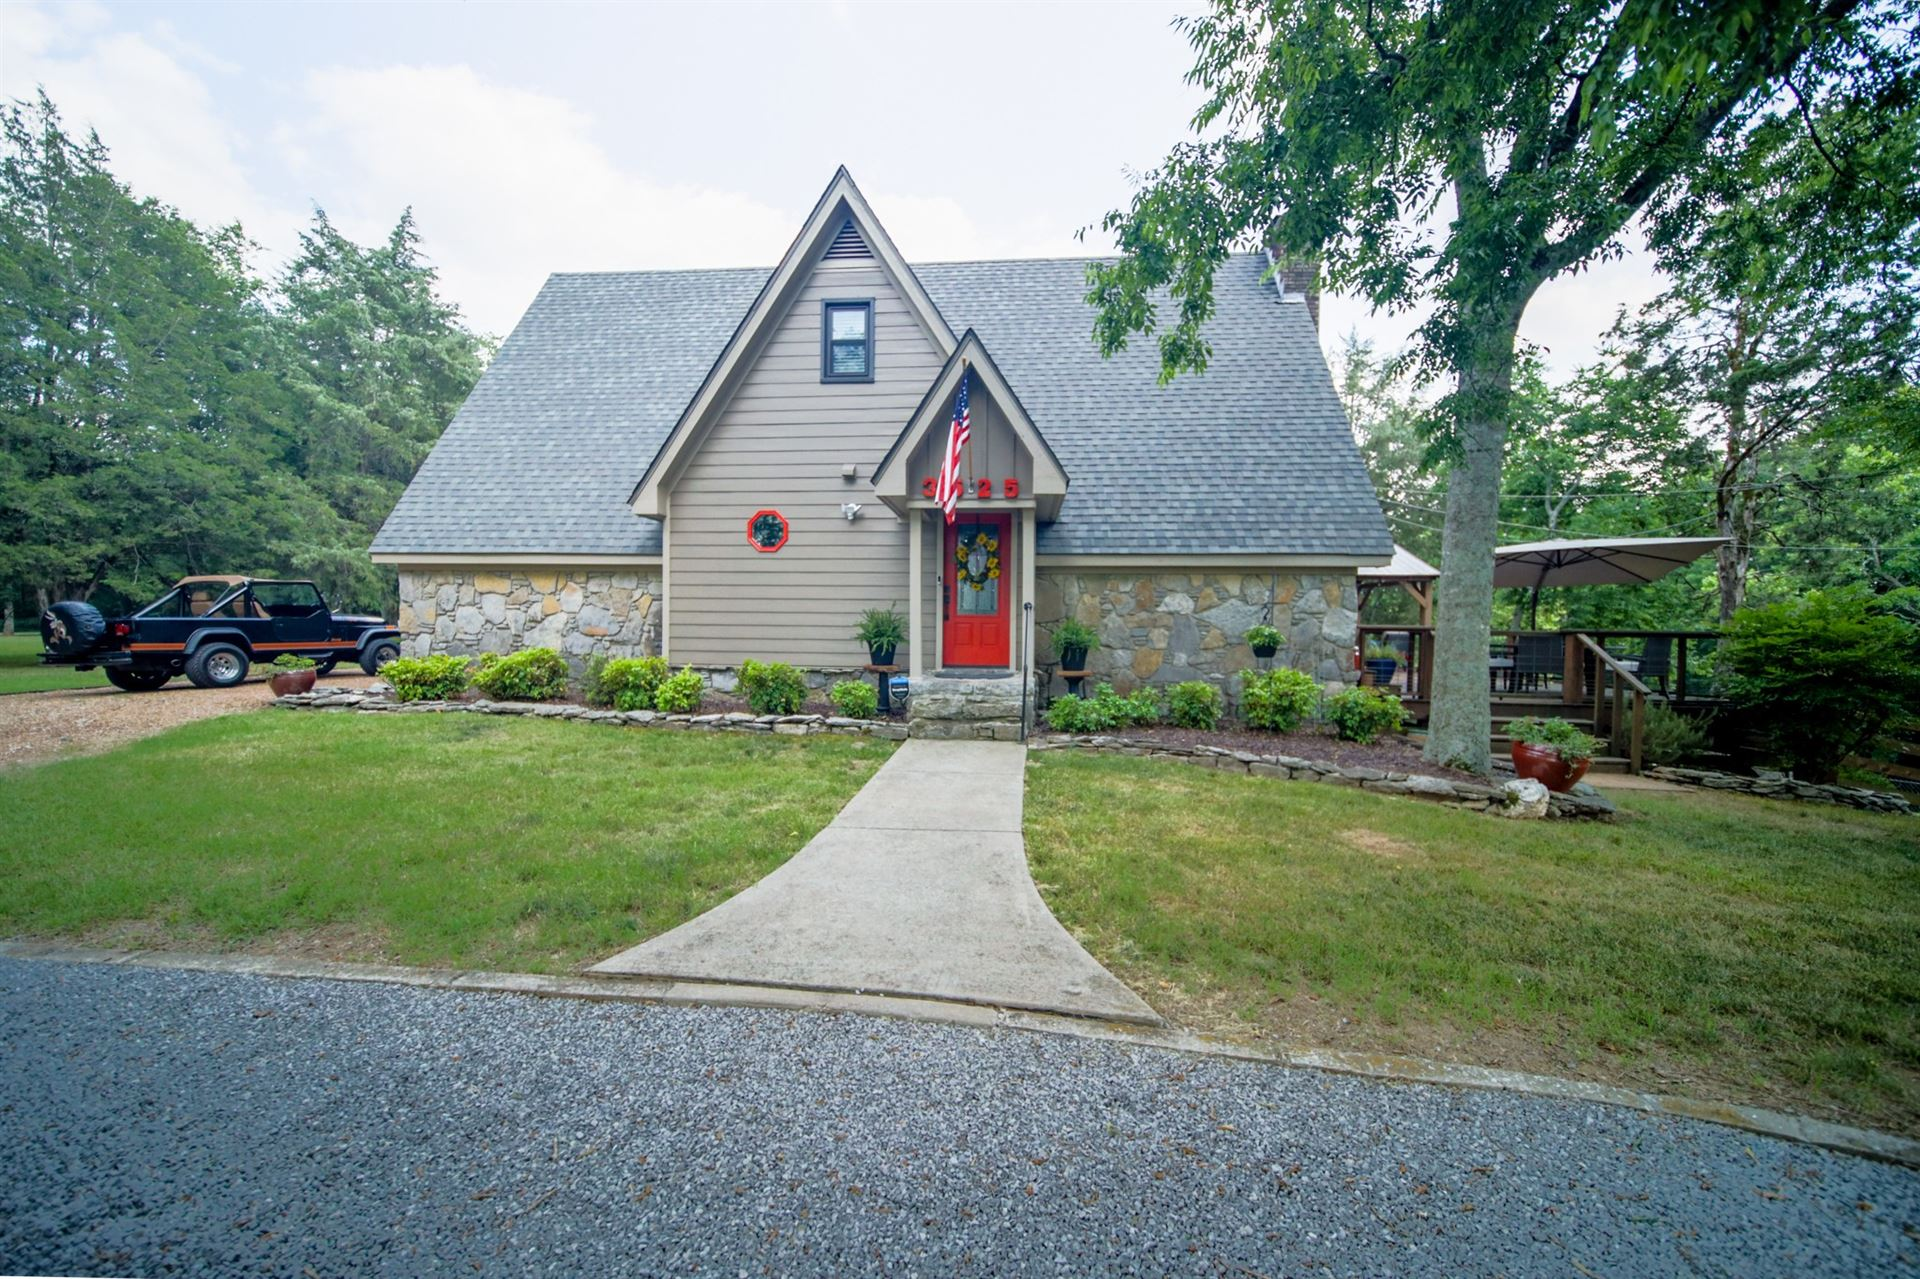 Photo of 3525 Shacklett Rd, Murfreesboro, TN 37129 (MLS # 2263536)